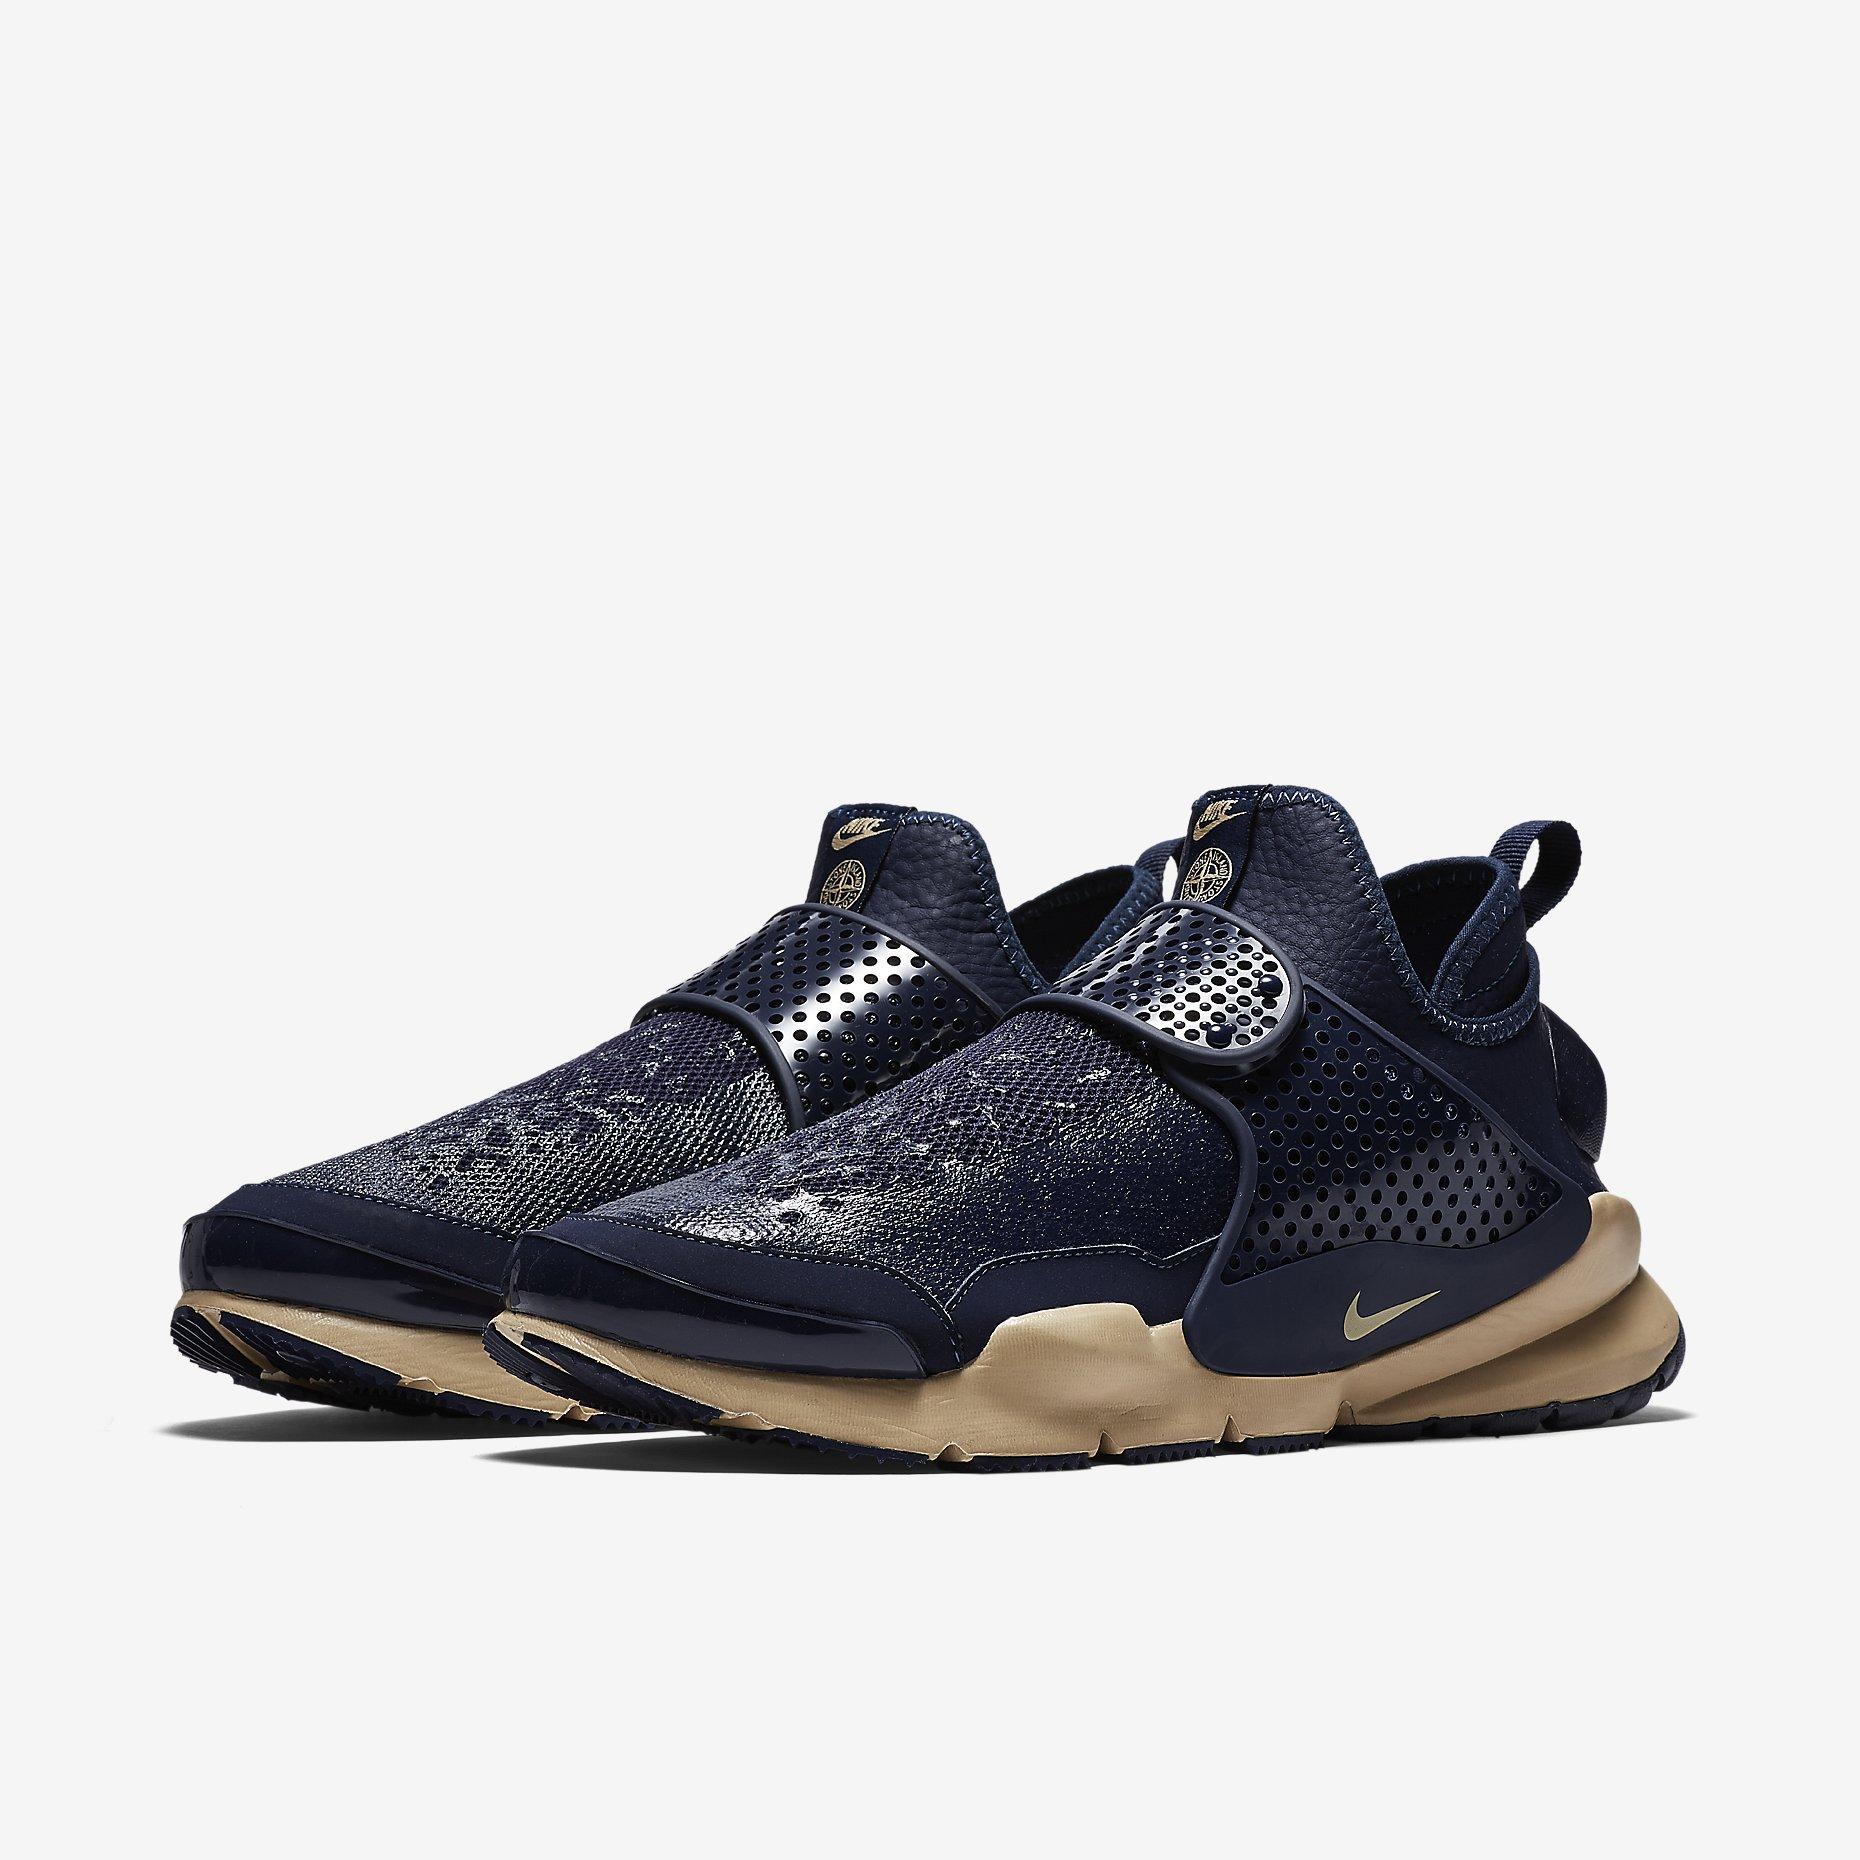 new arrival 5094b fe872 Very Goods | NikeLab x Stone Island Sock Dart Mid SP Men's ...